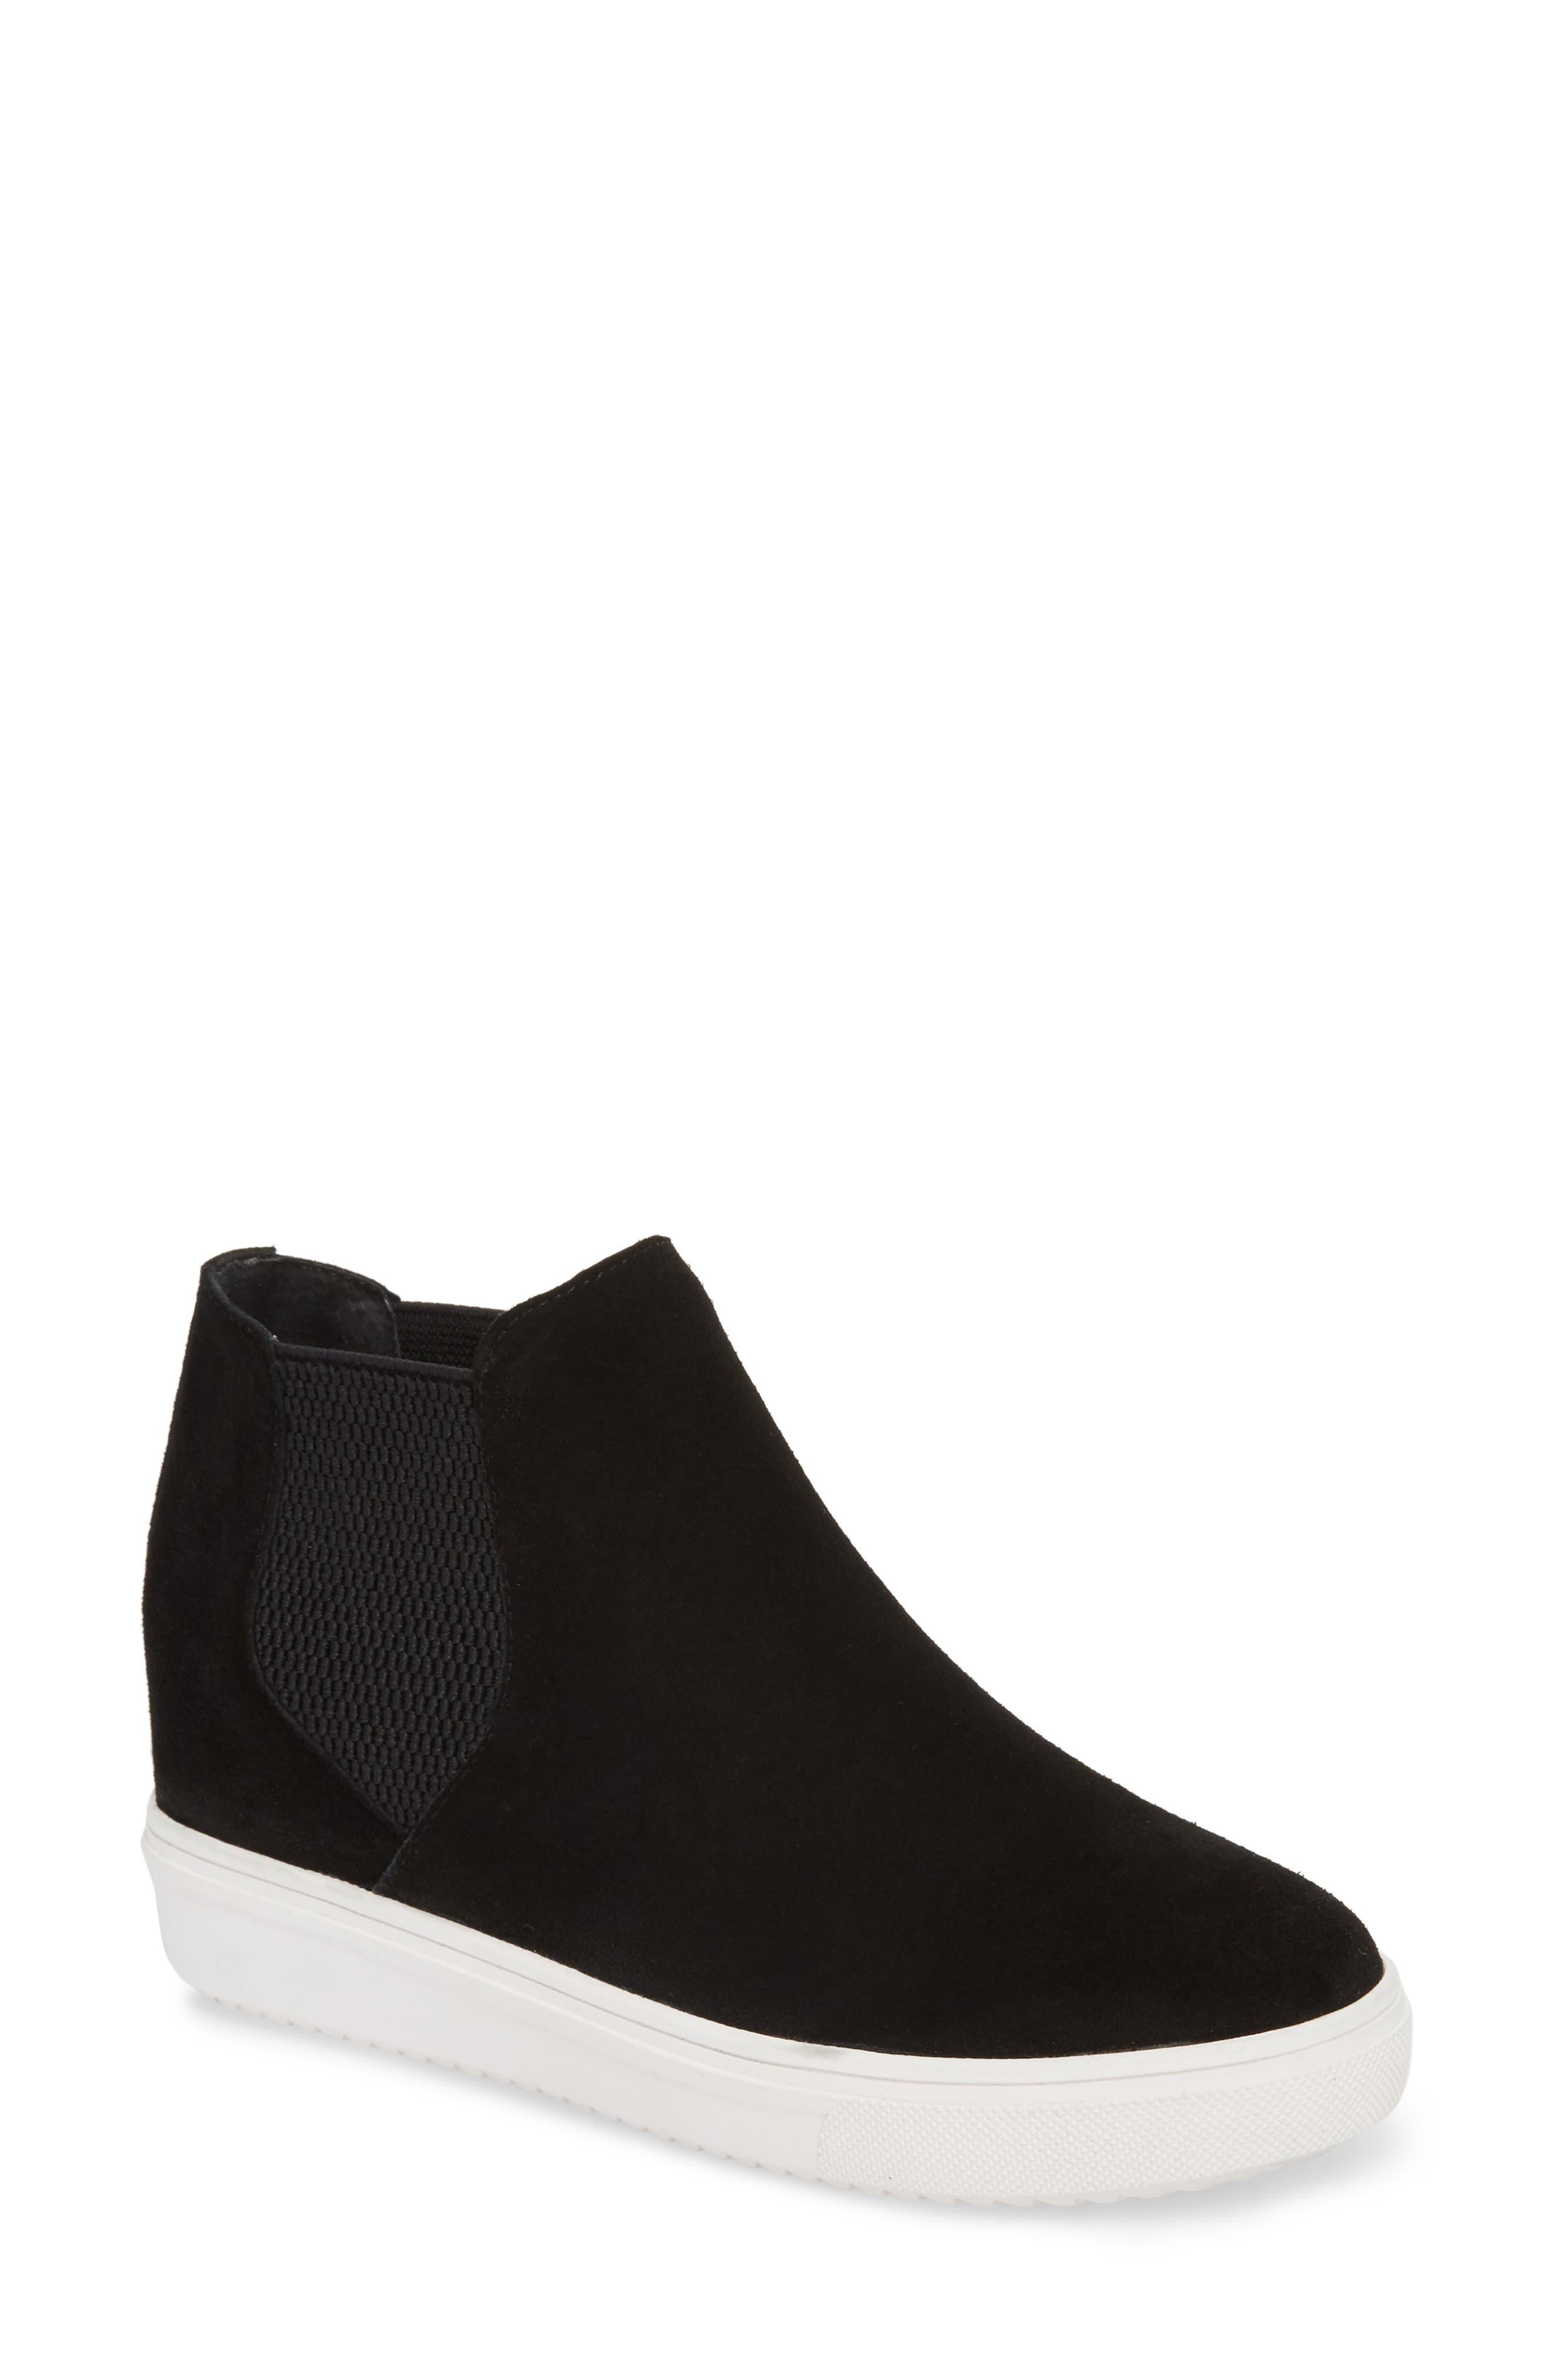 Sultan Chelsea Wedge Sneaker,                             Main thumbnail 1, color,                             BLACK SUEDE